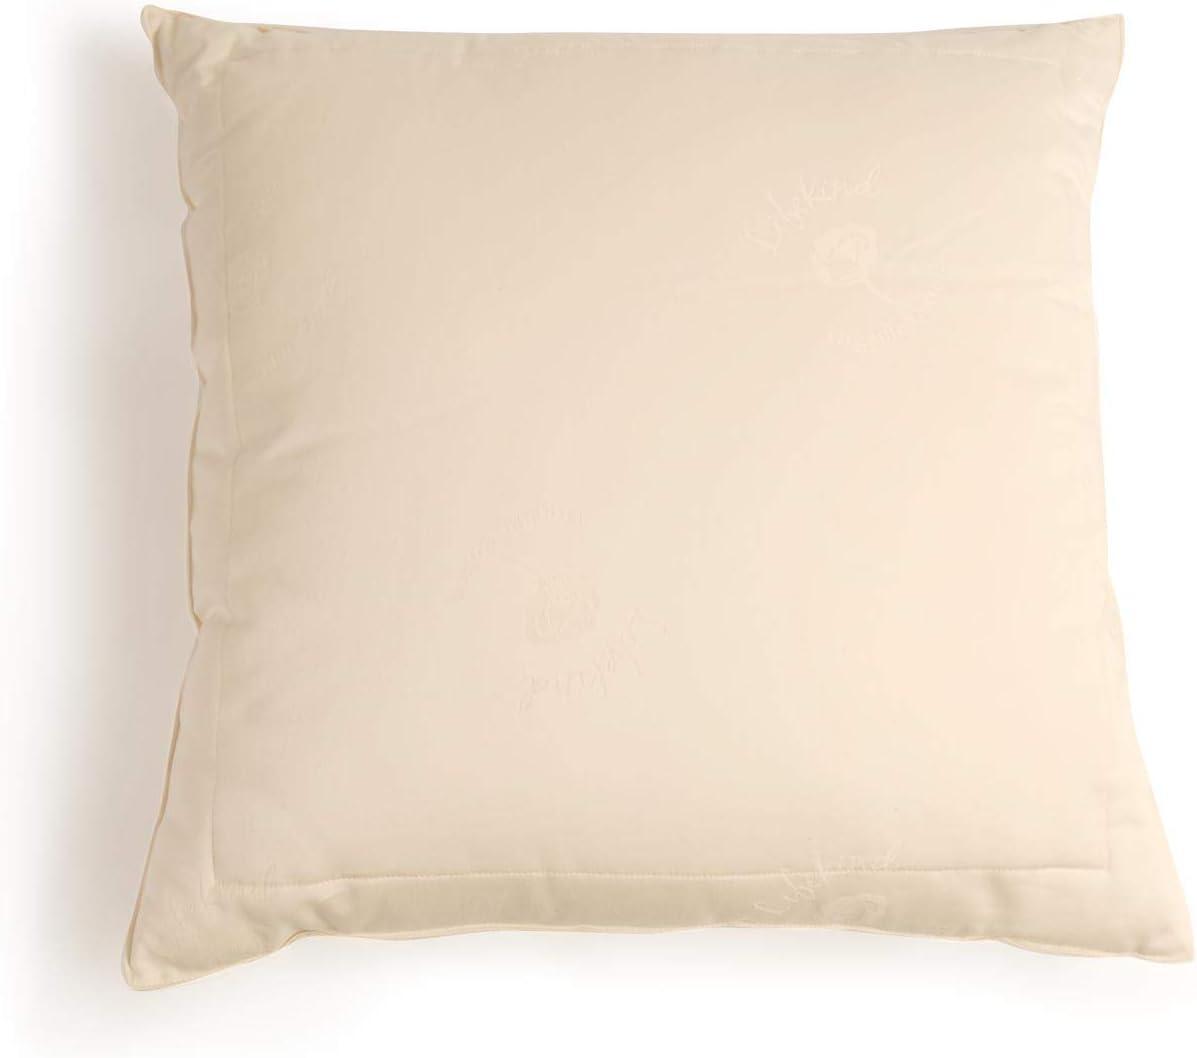 Amazon Com Lifekind Certified Organic Cotton Euro Square Pillow Size 26 X 26 Inches Home Kitchen